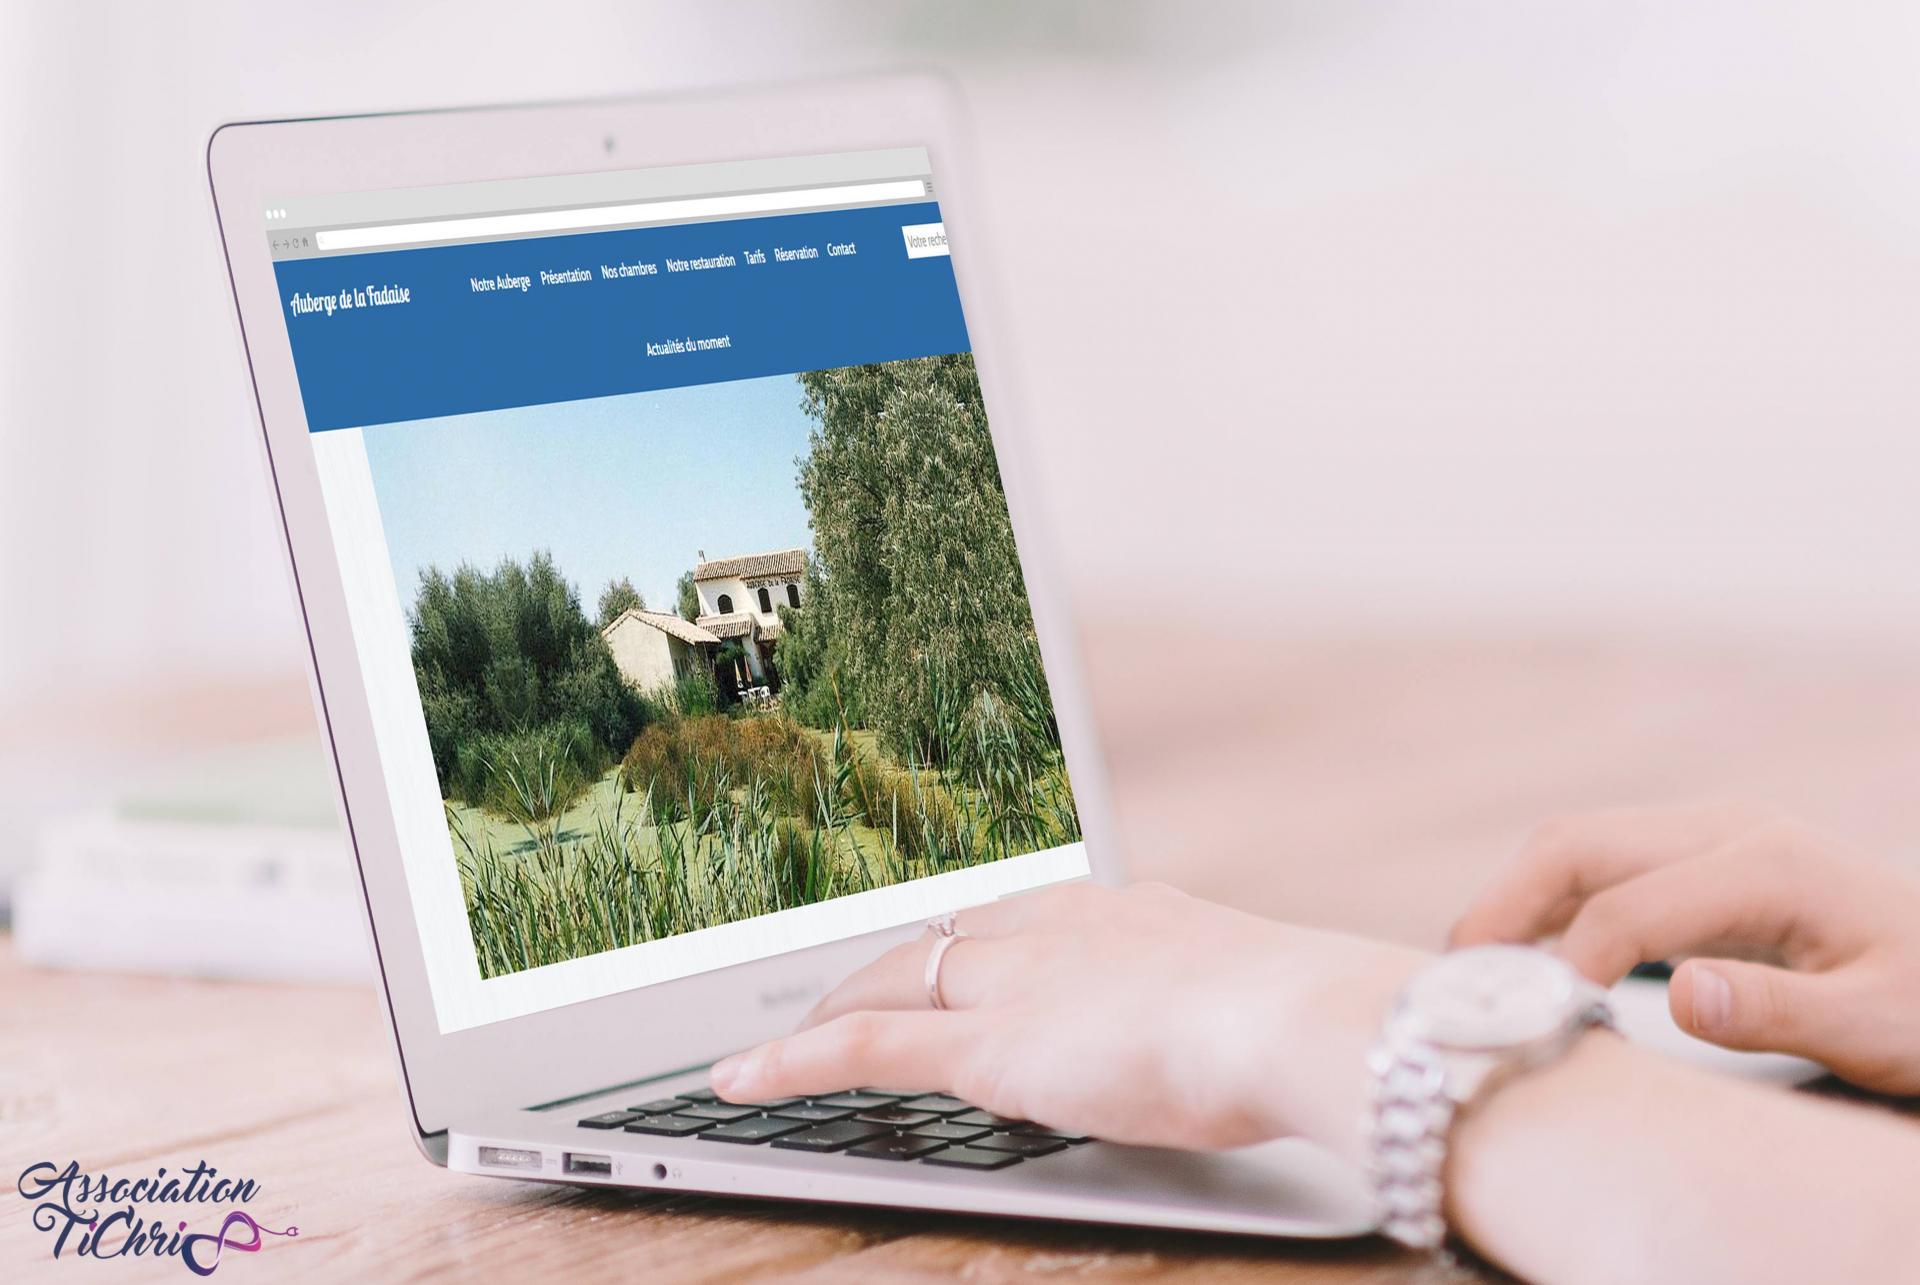 Centre de formation site web tichri48